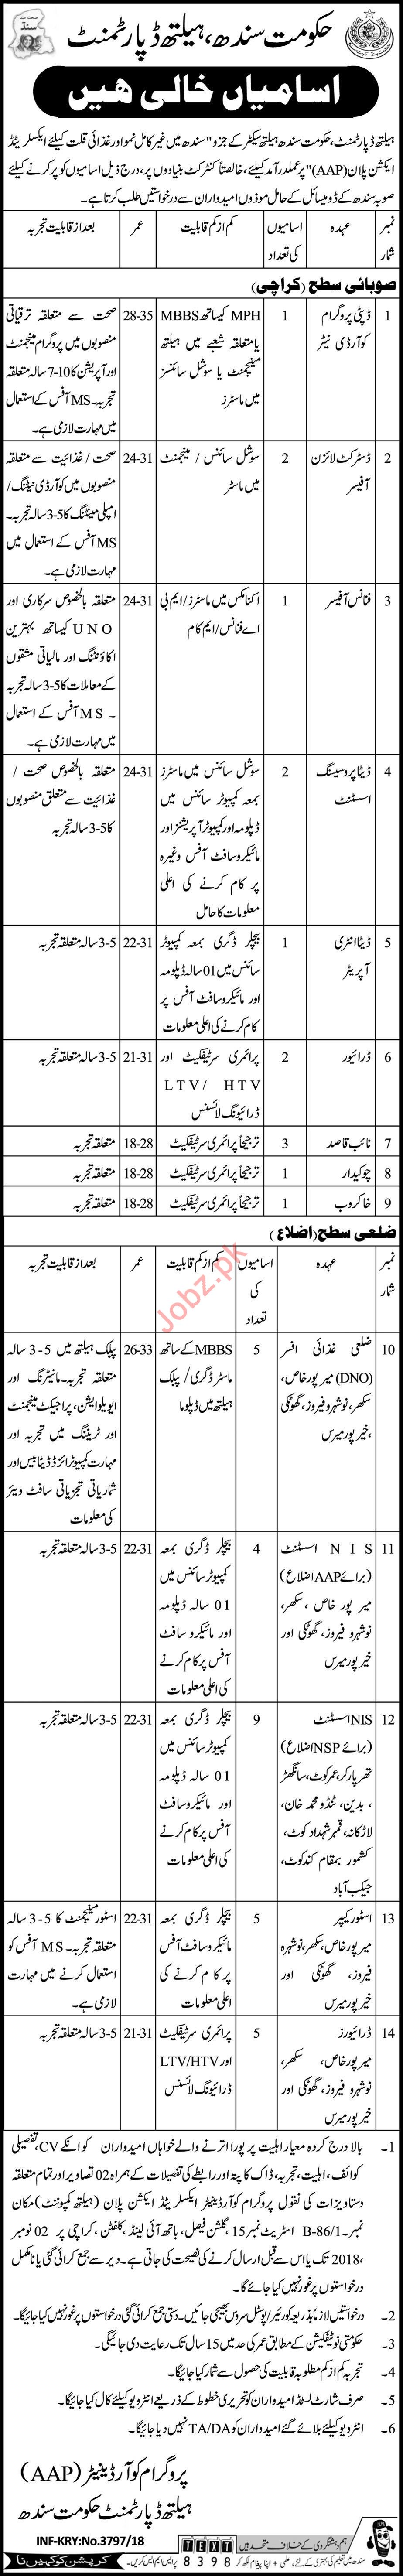 Health Department Jobs 2018 in Karachi Sindh